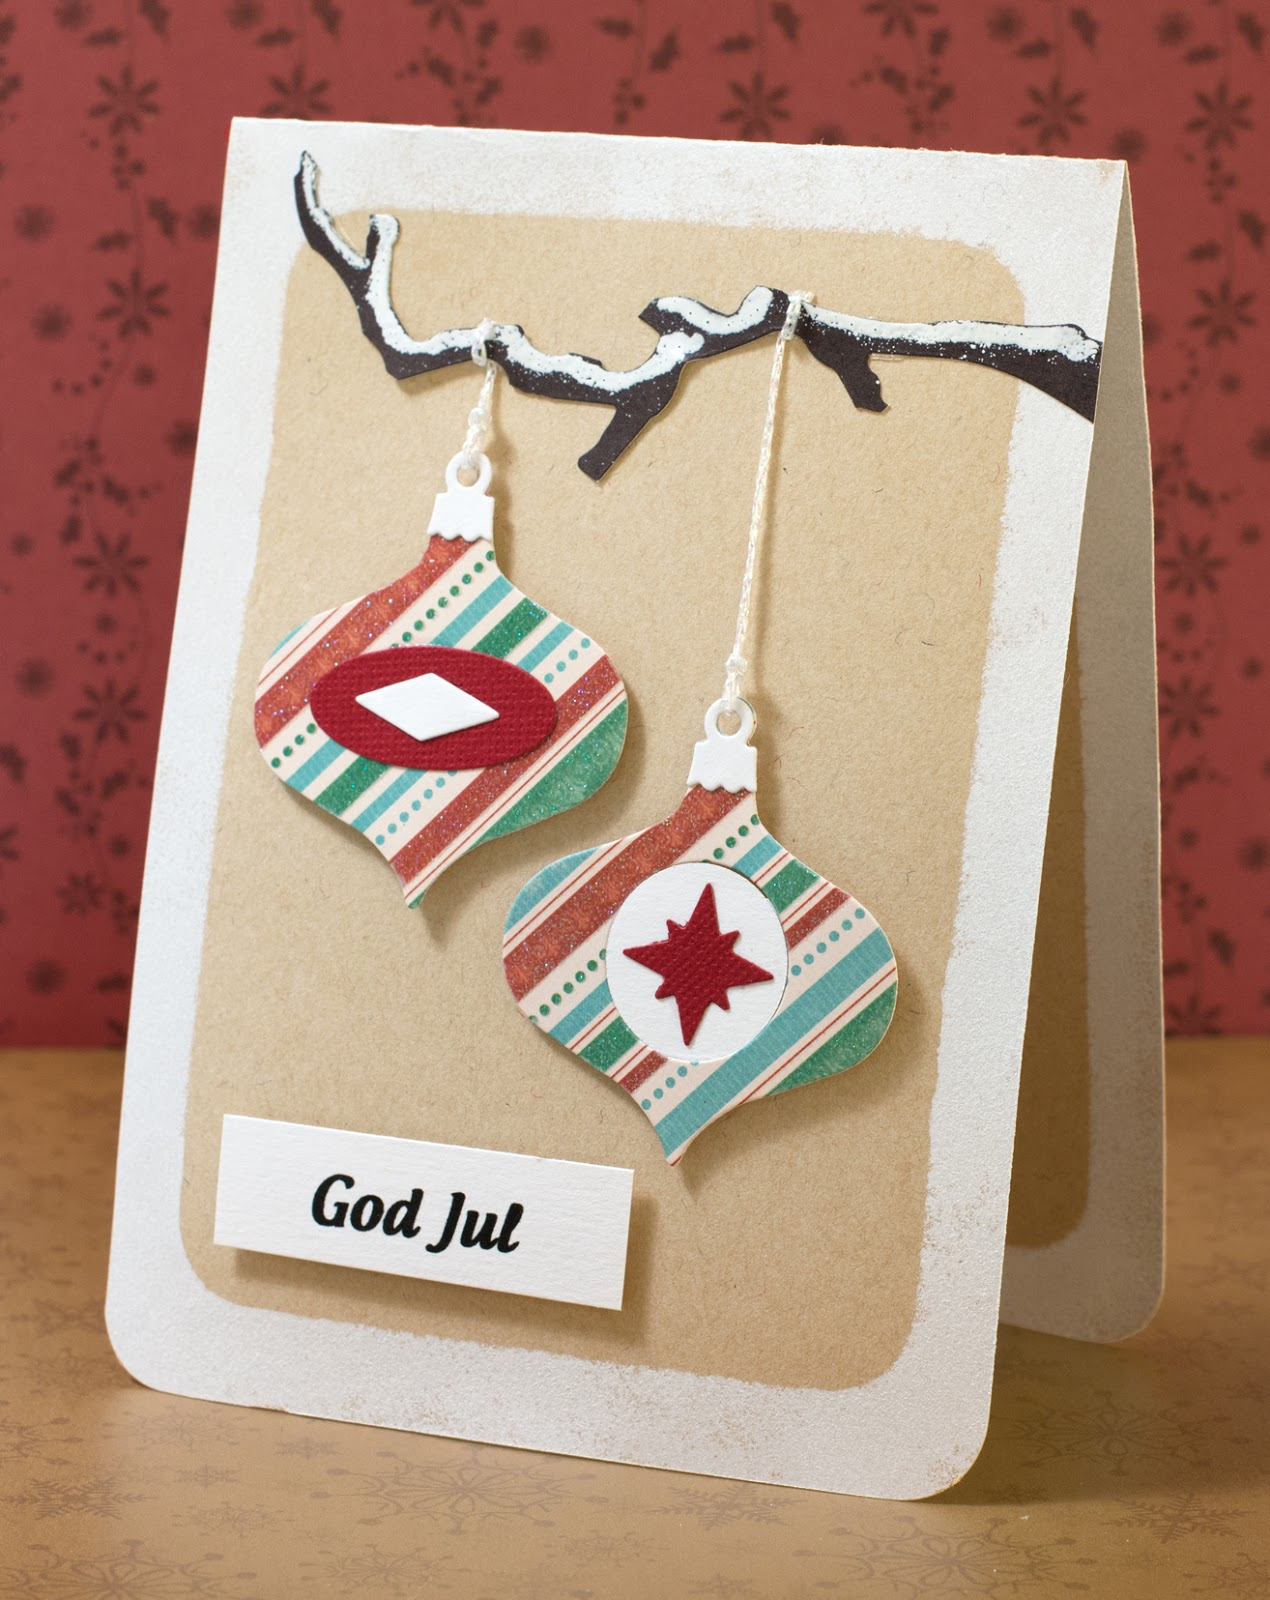 Cardmaking: Card for Allt Om Scrap: Die-cut Christmas card